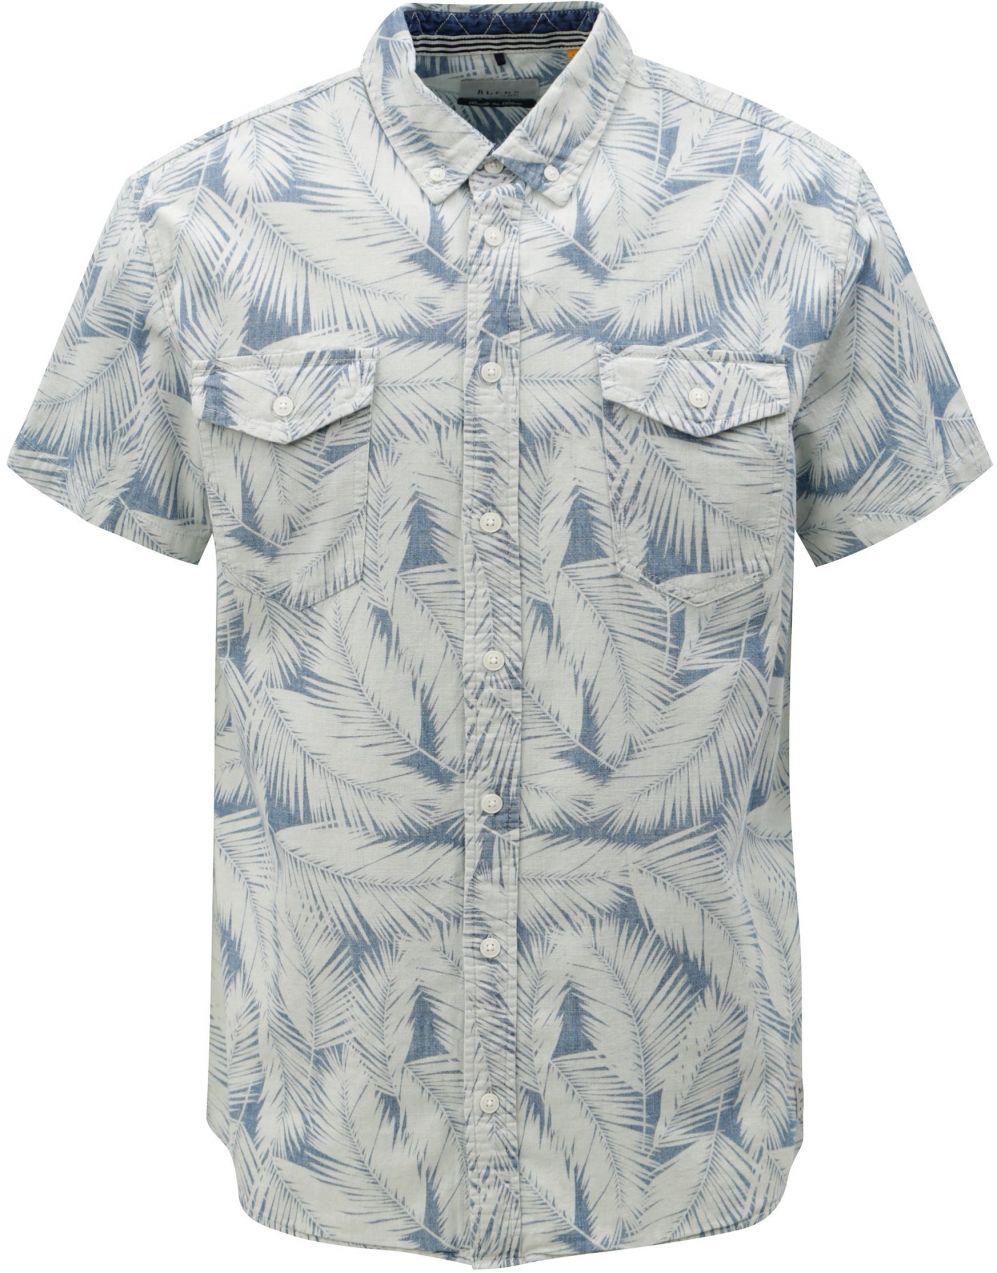 eacbb6f75f4c Modro-krémová vzorovaná slim fit košeľa Blend značky Blend - Lovely.sk